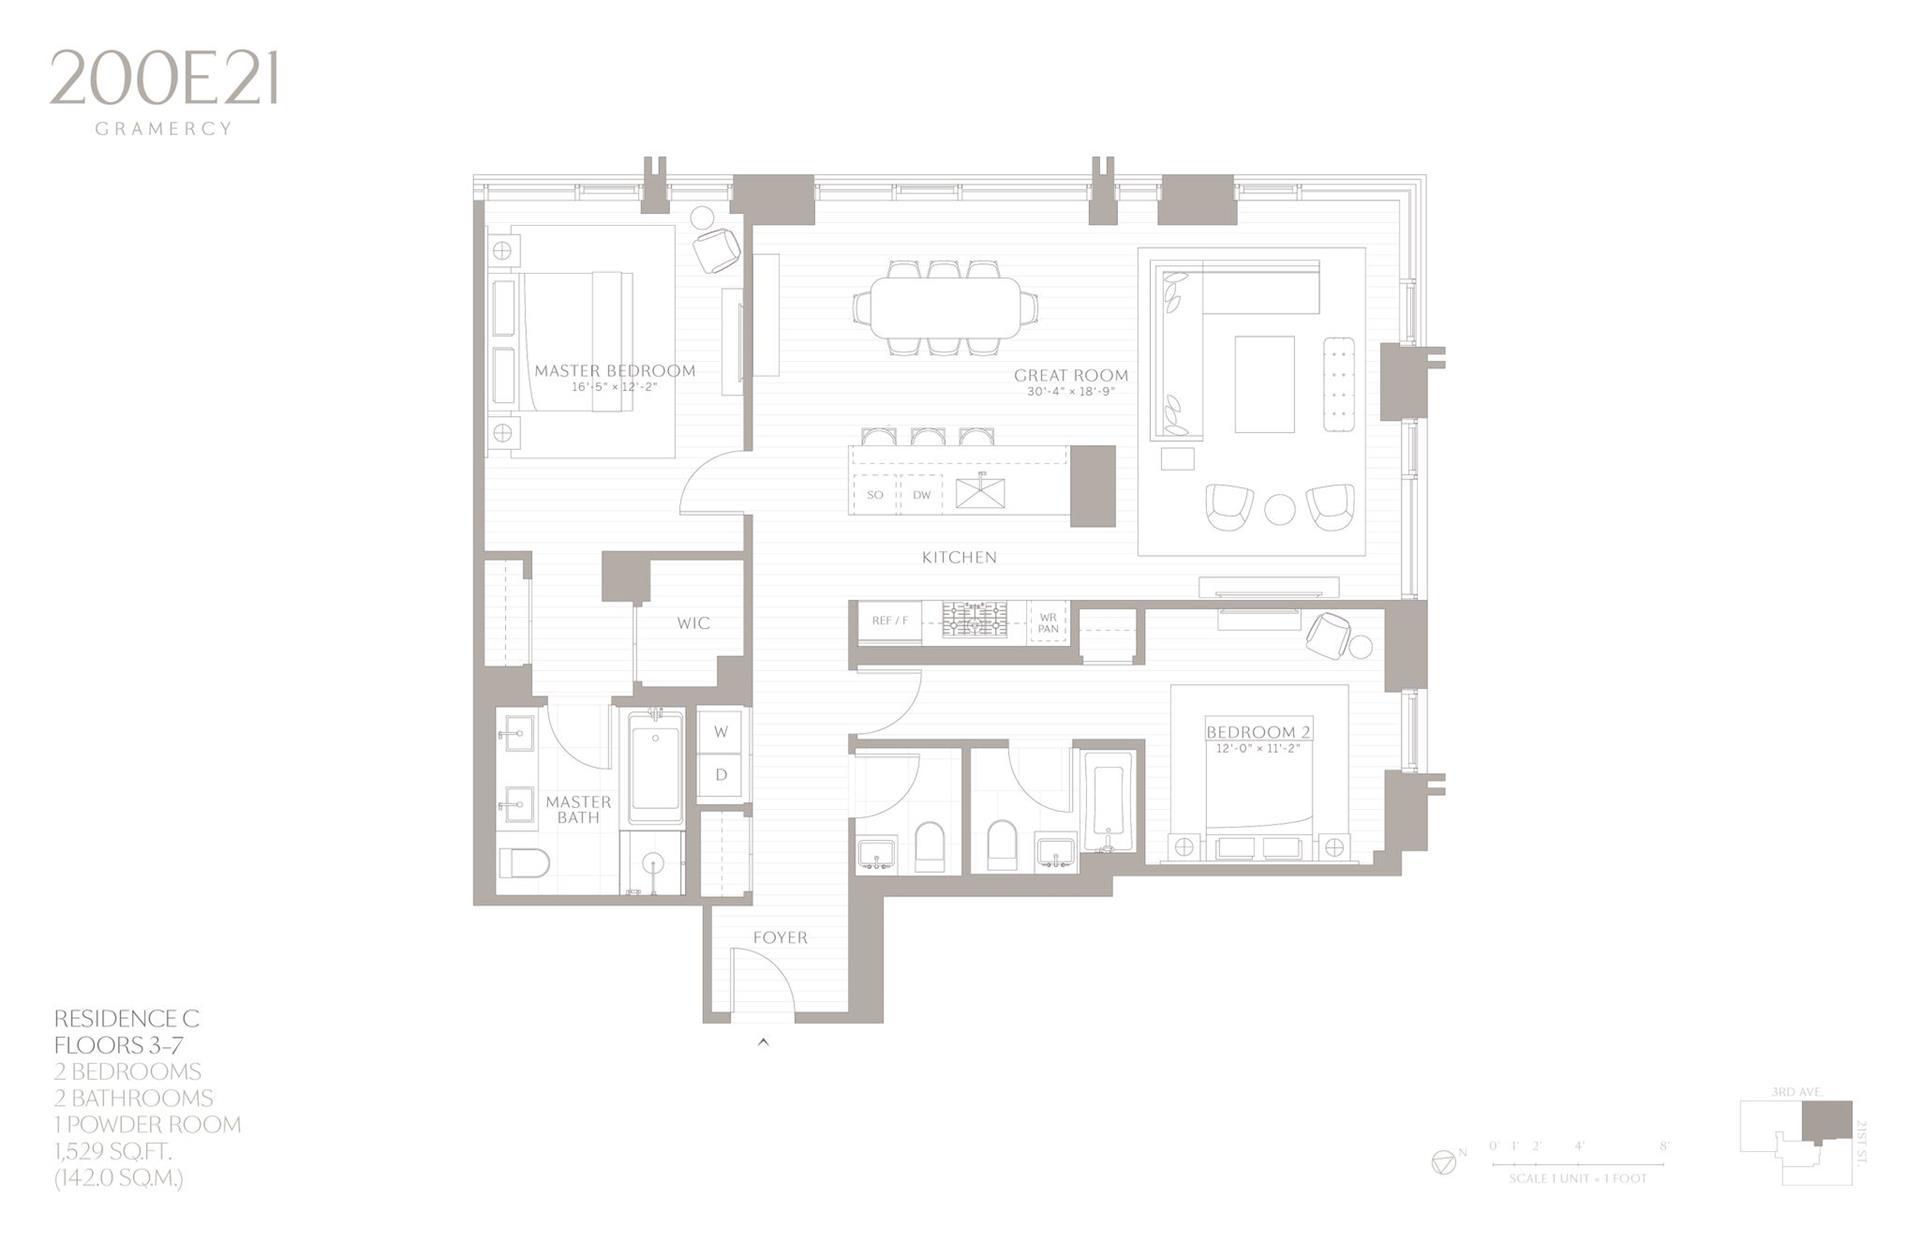 Floor plan of 200 East 21st St, 3C - Gramercy - Union Square, New York